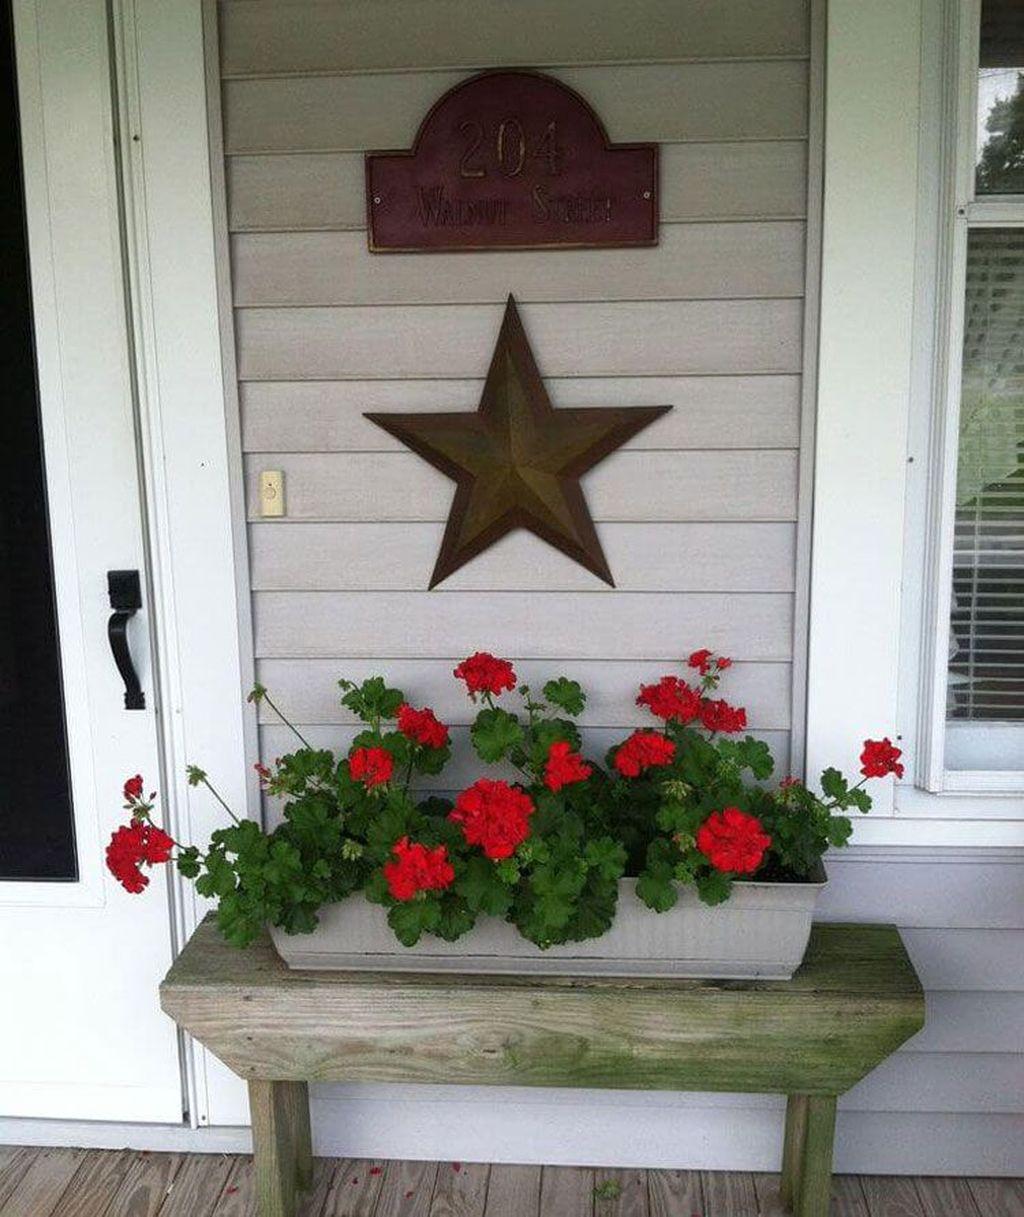 Inspiring Spring Planters Design Ideas For Front Door 05